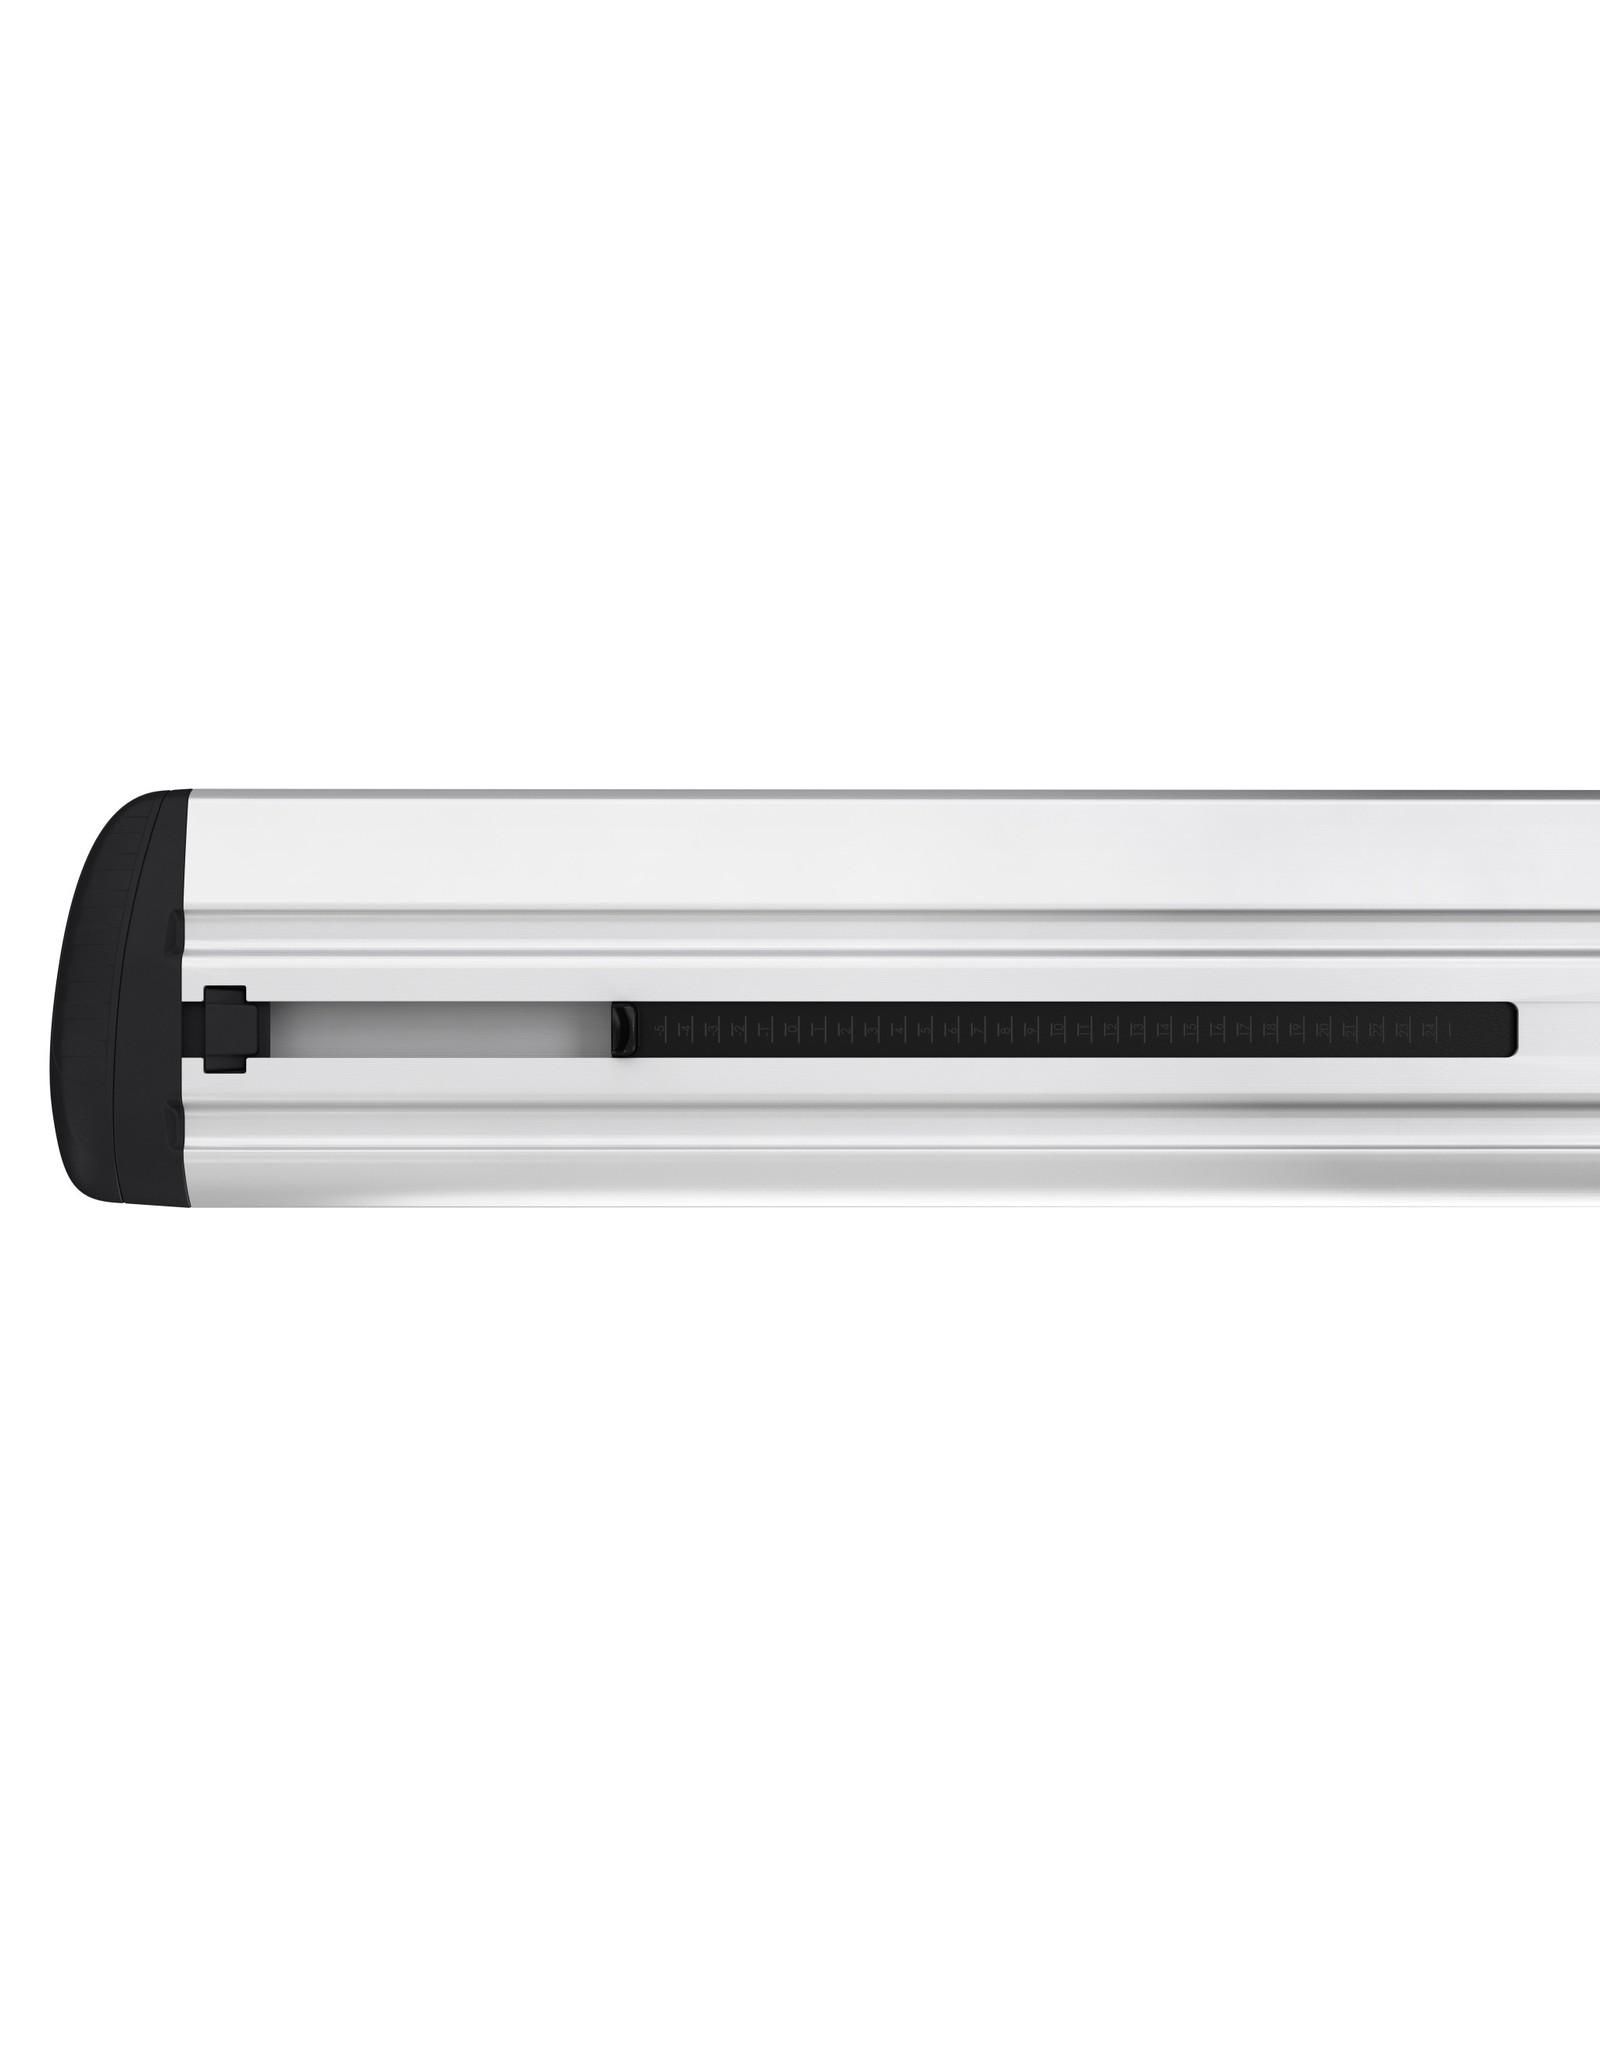 "THULE Wingbar Evo 150 (60"") Silver"